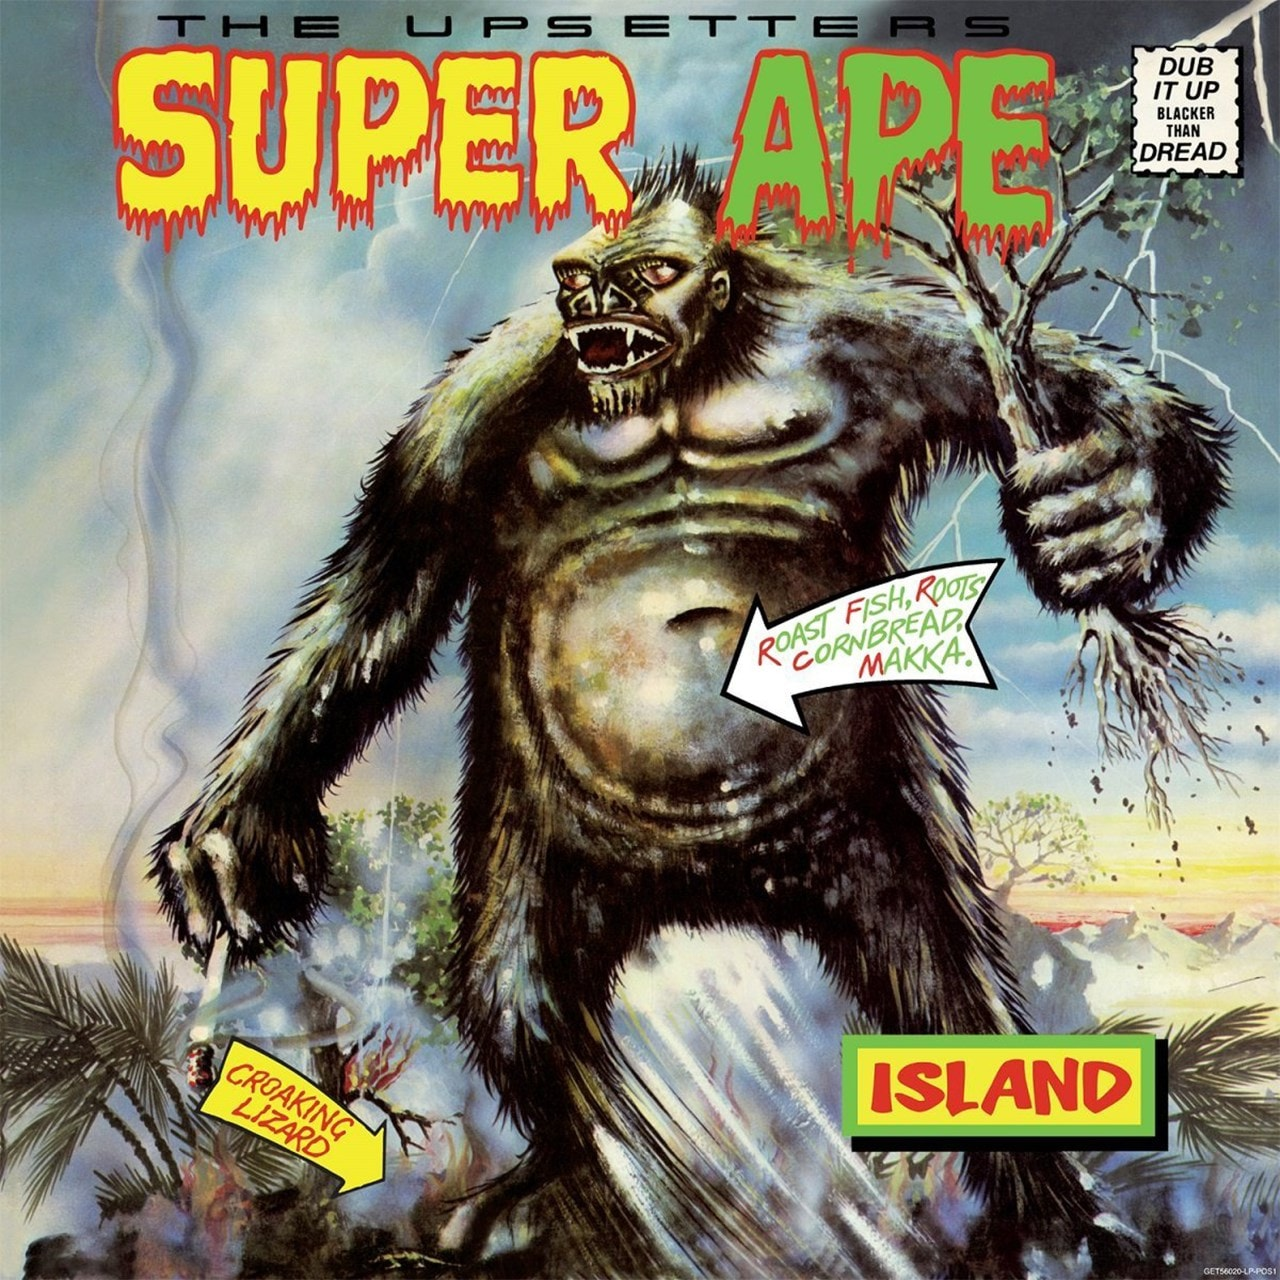 Super Ape: Dub It Up Blacker Than Dread - 1